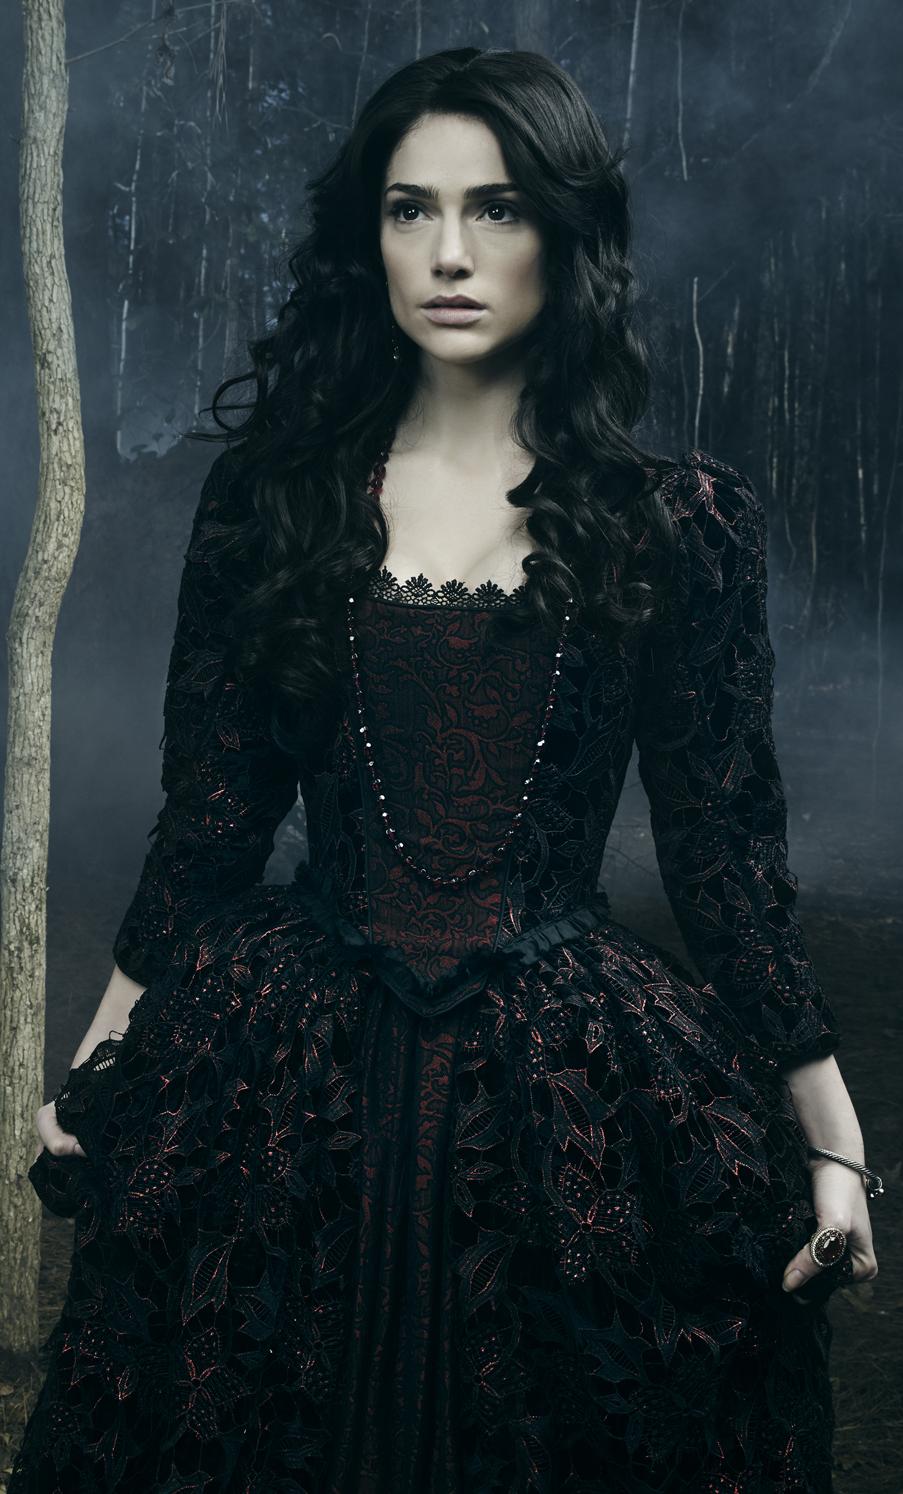 Like dress a witch from salem photos